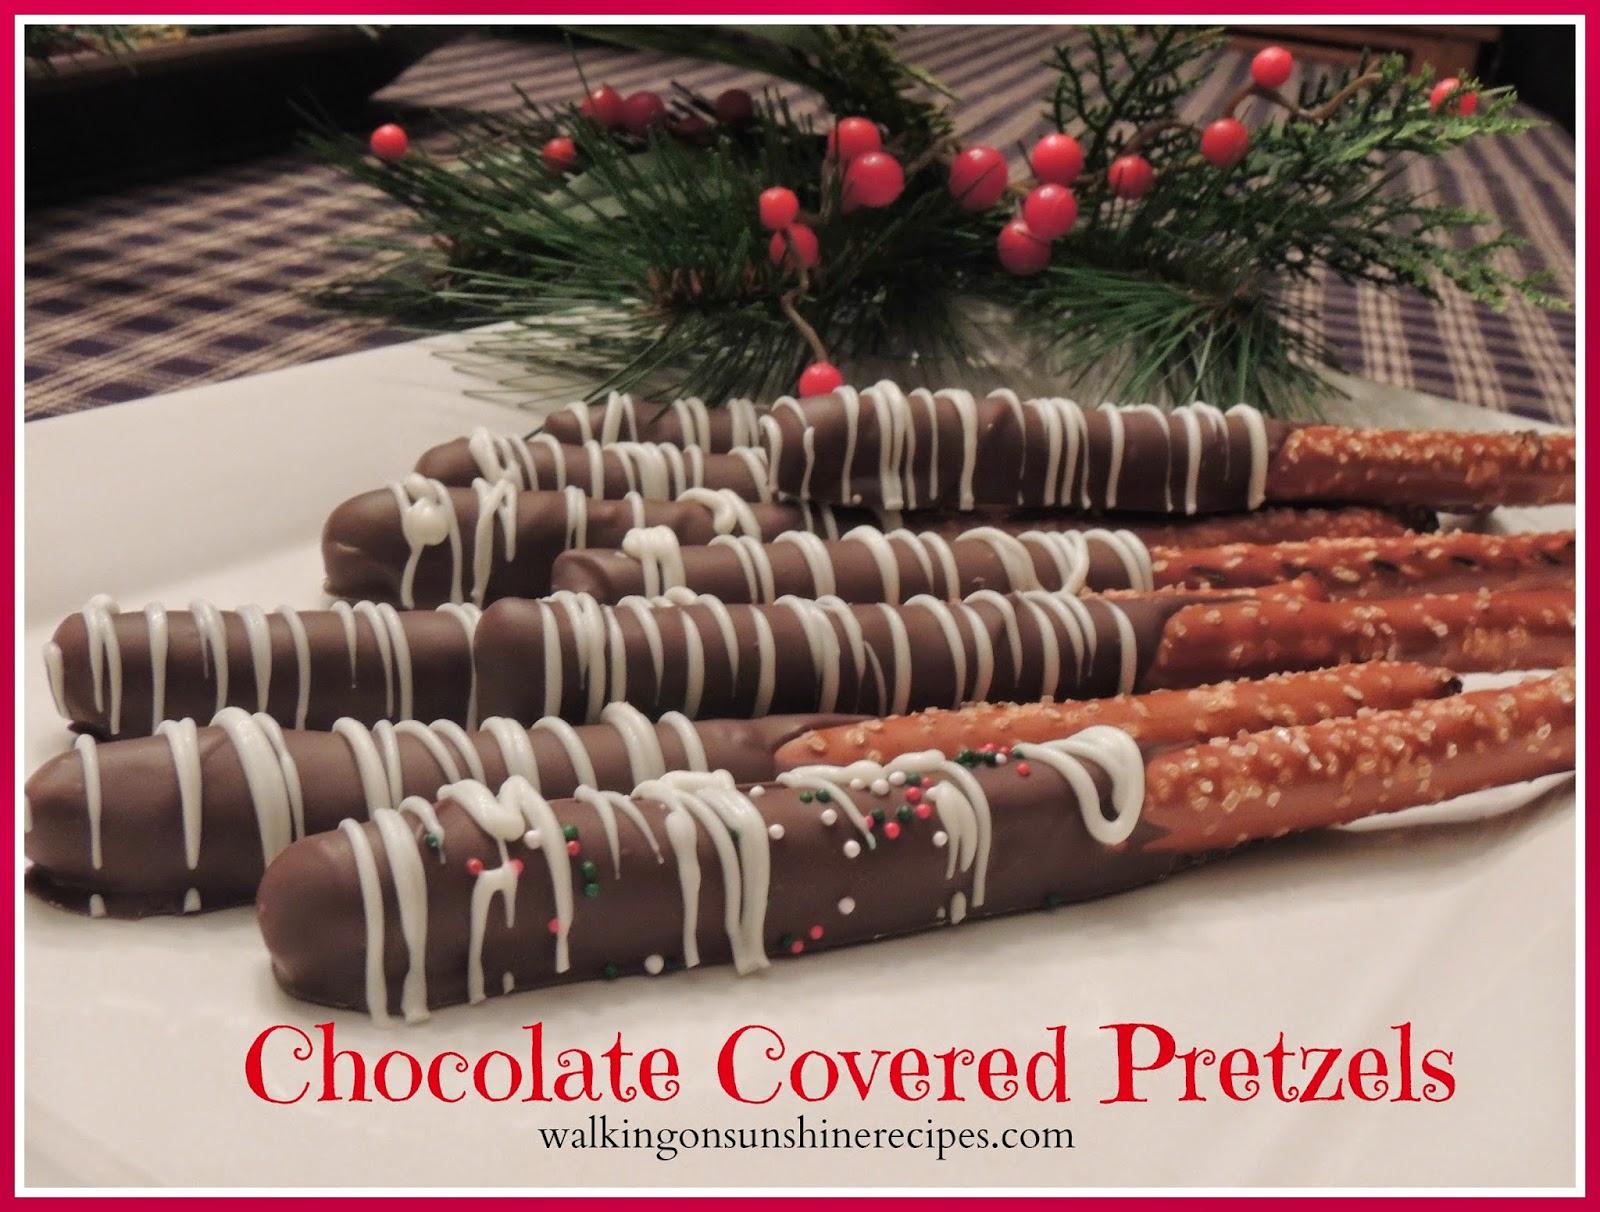 Chocolate Covered Pretzels / Walking on Sunshine Recipes